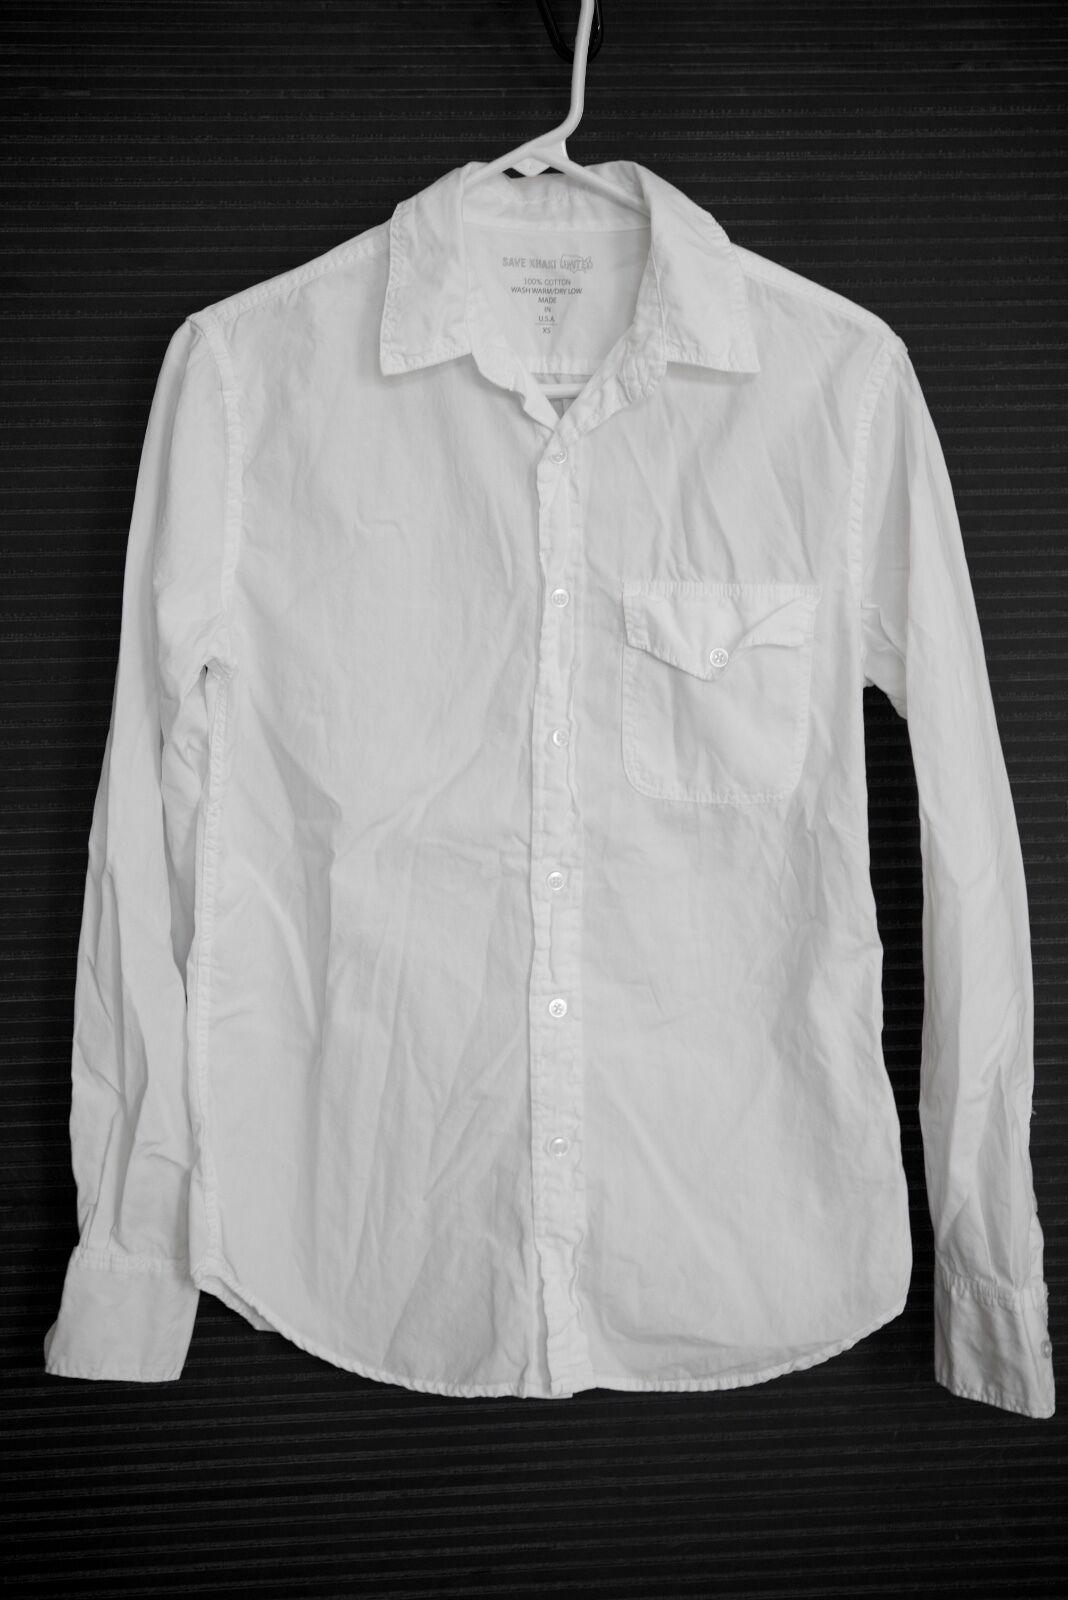 NEW Save Khaki Men's Poplin Work Shirt Extra Small XS - White S.K.U. 100% Cotton